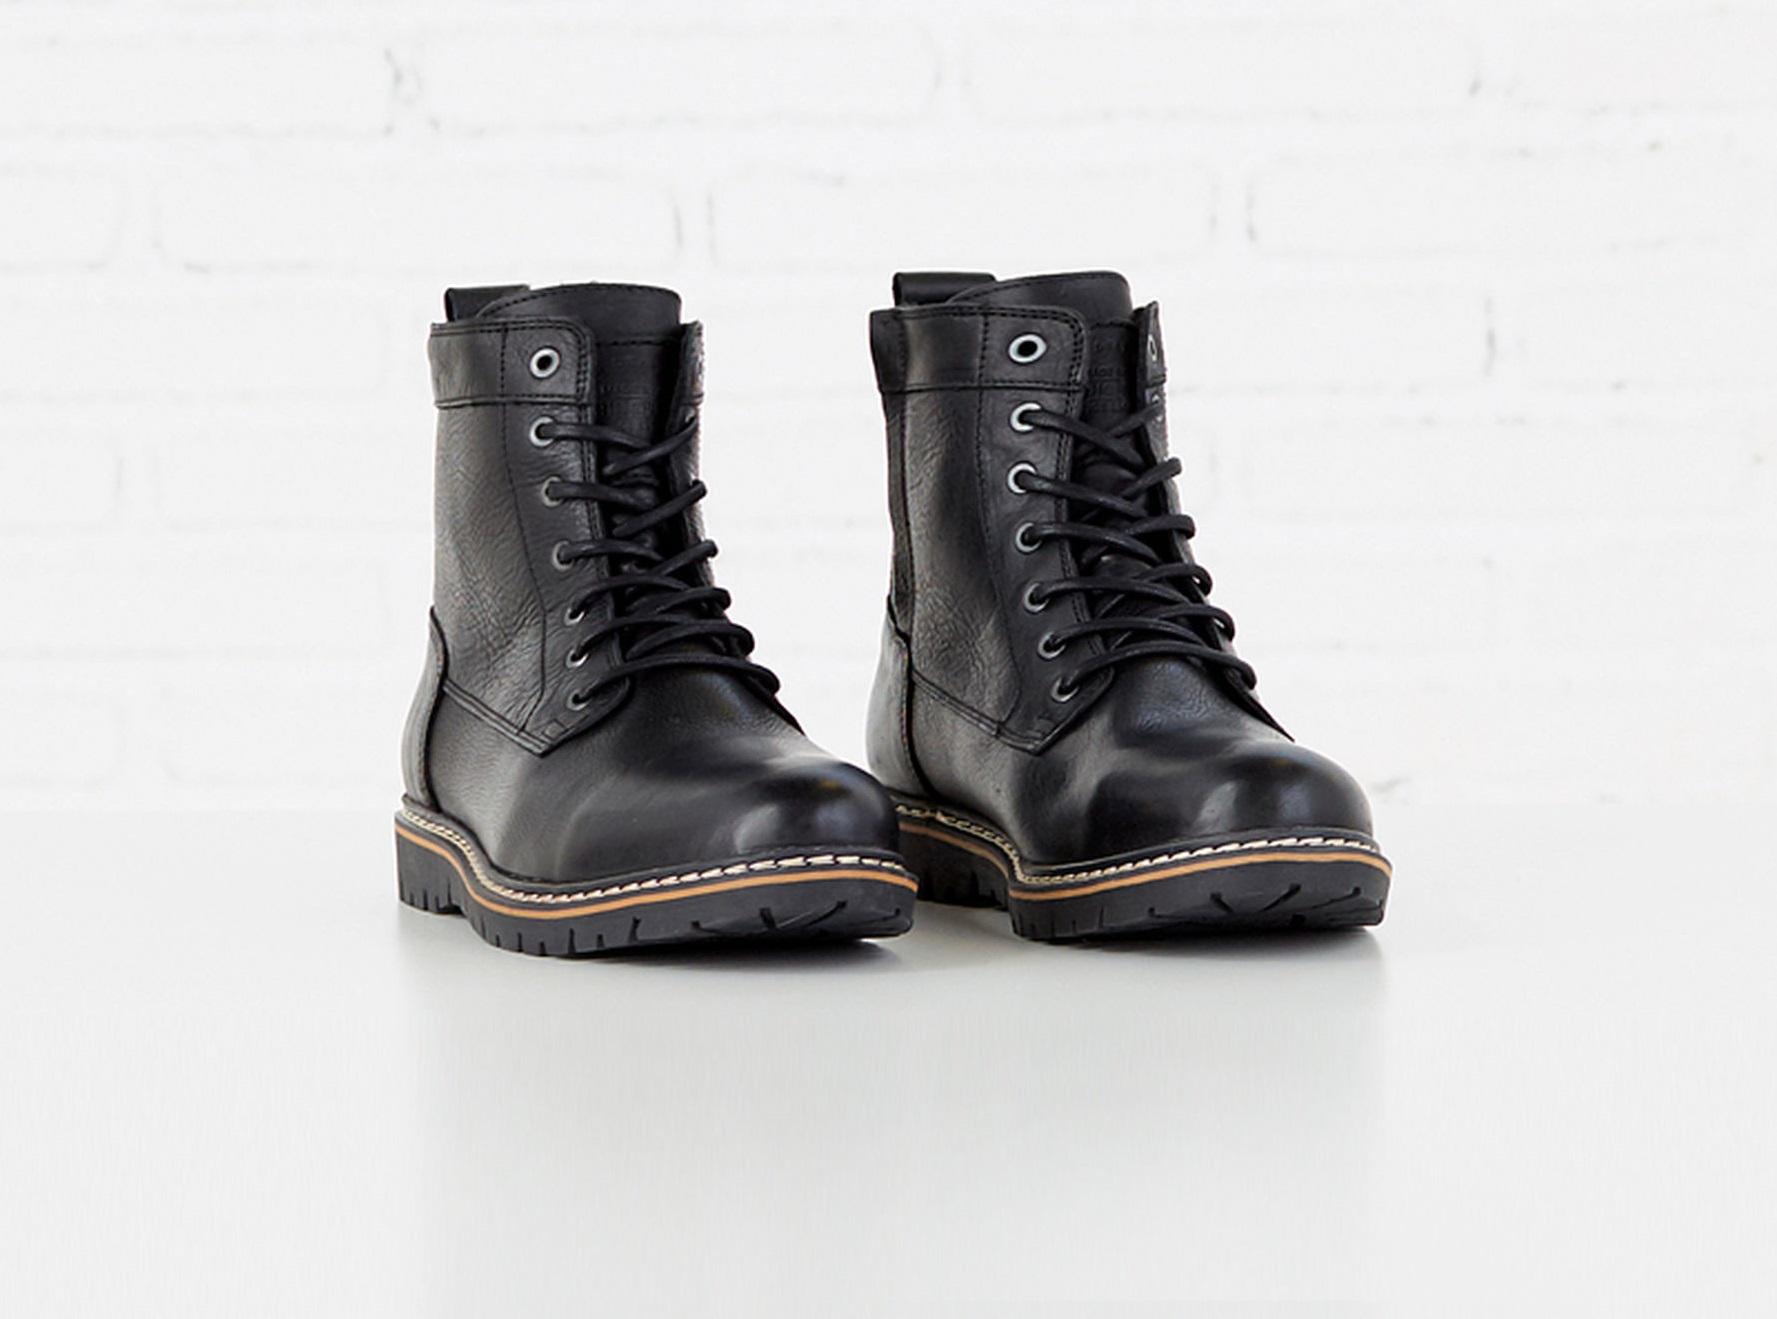 bota-negra-piel-calidad-premium-hecha-en-portugal1